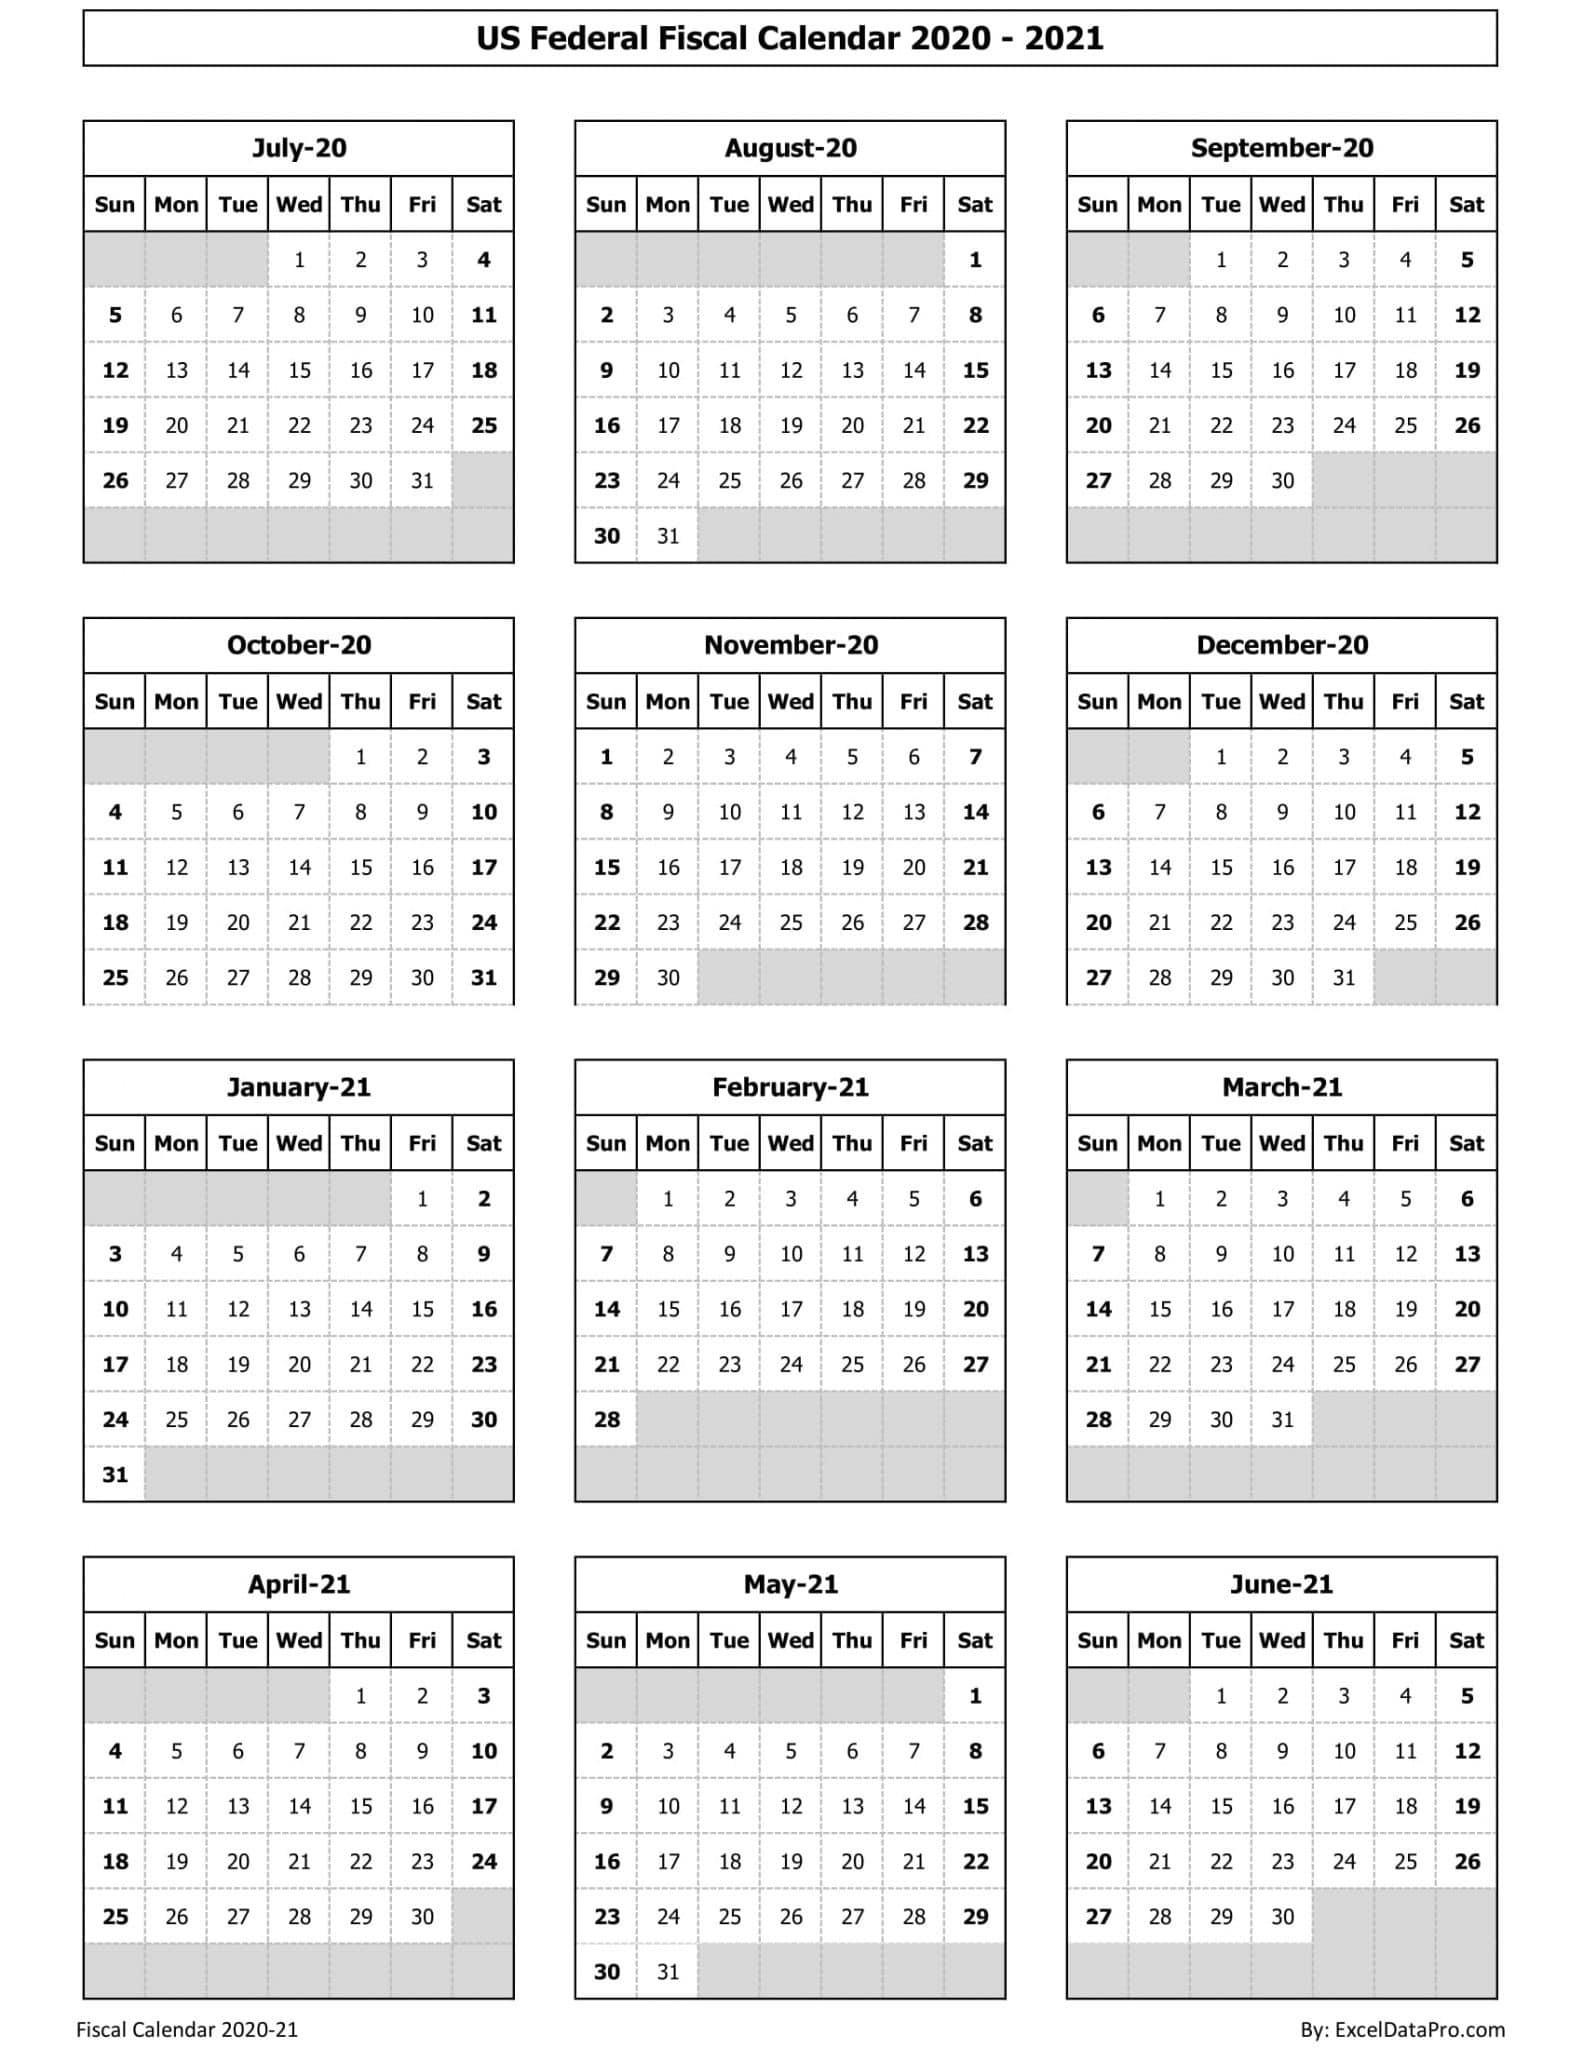 Edi Suparman - Page 17 - Template Calendar Design  Aus 2021-2021 Financial Year Period